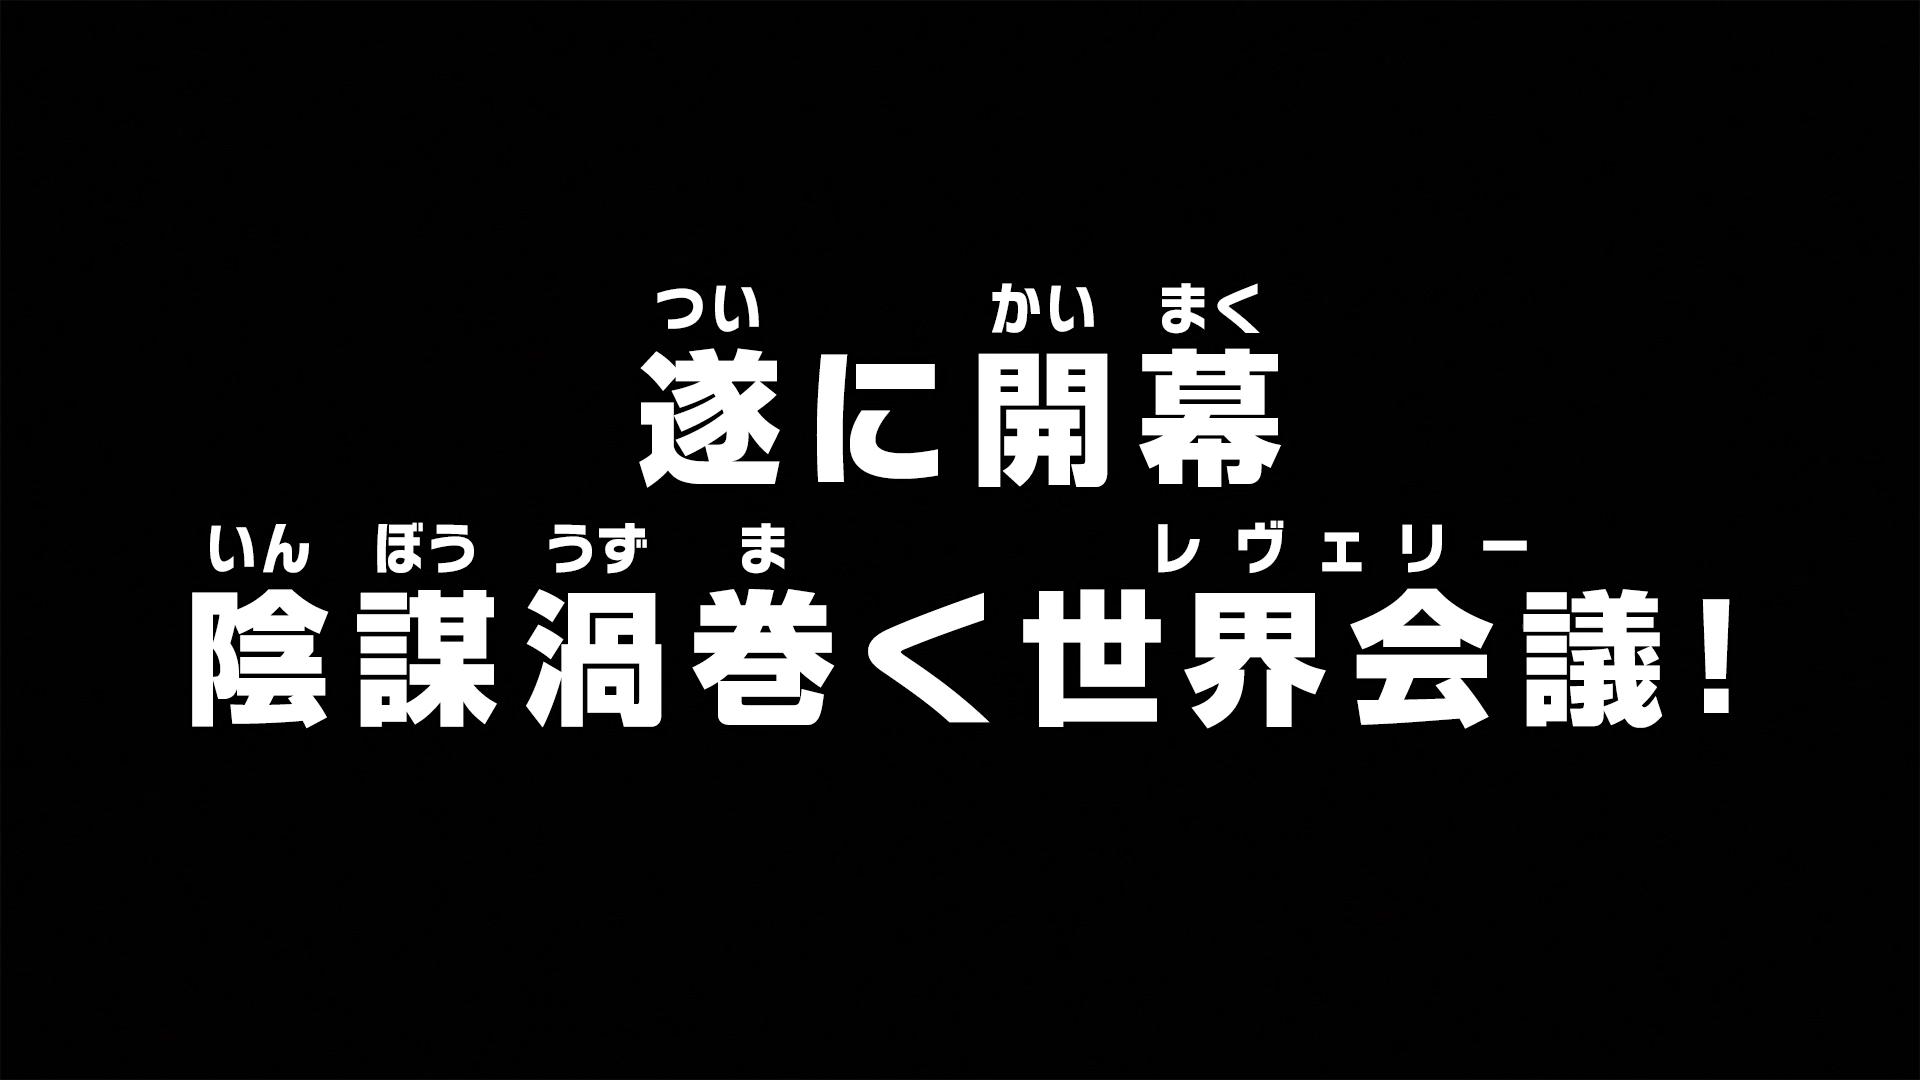 Episode 889